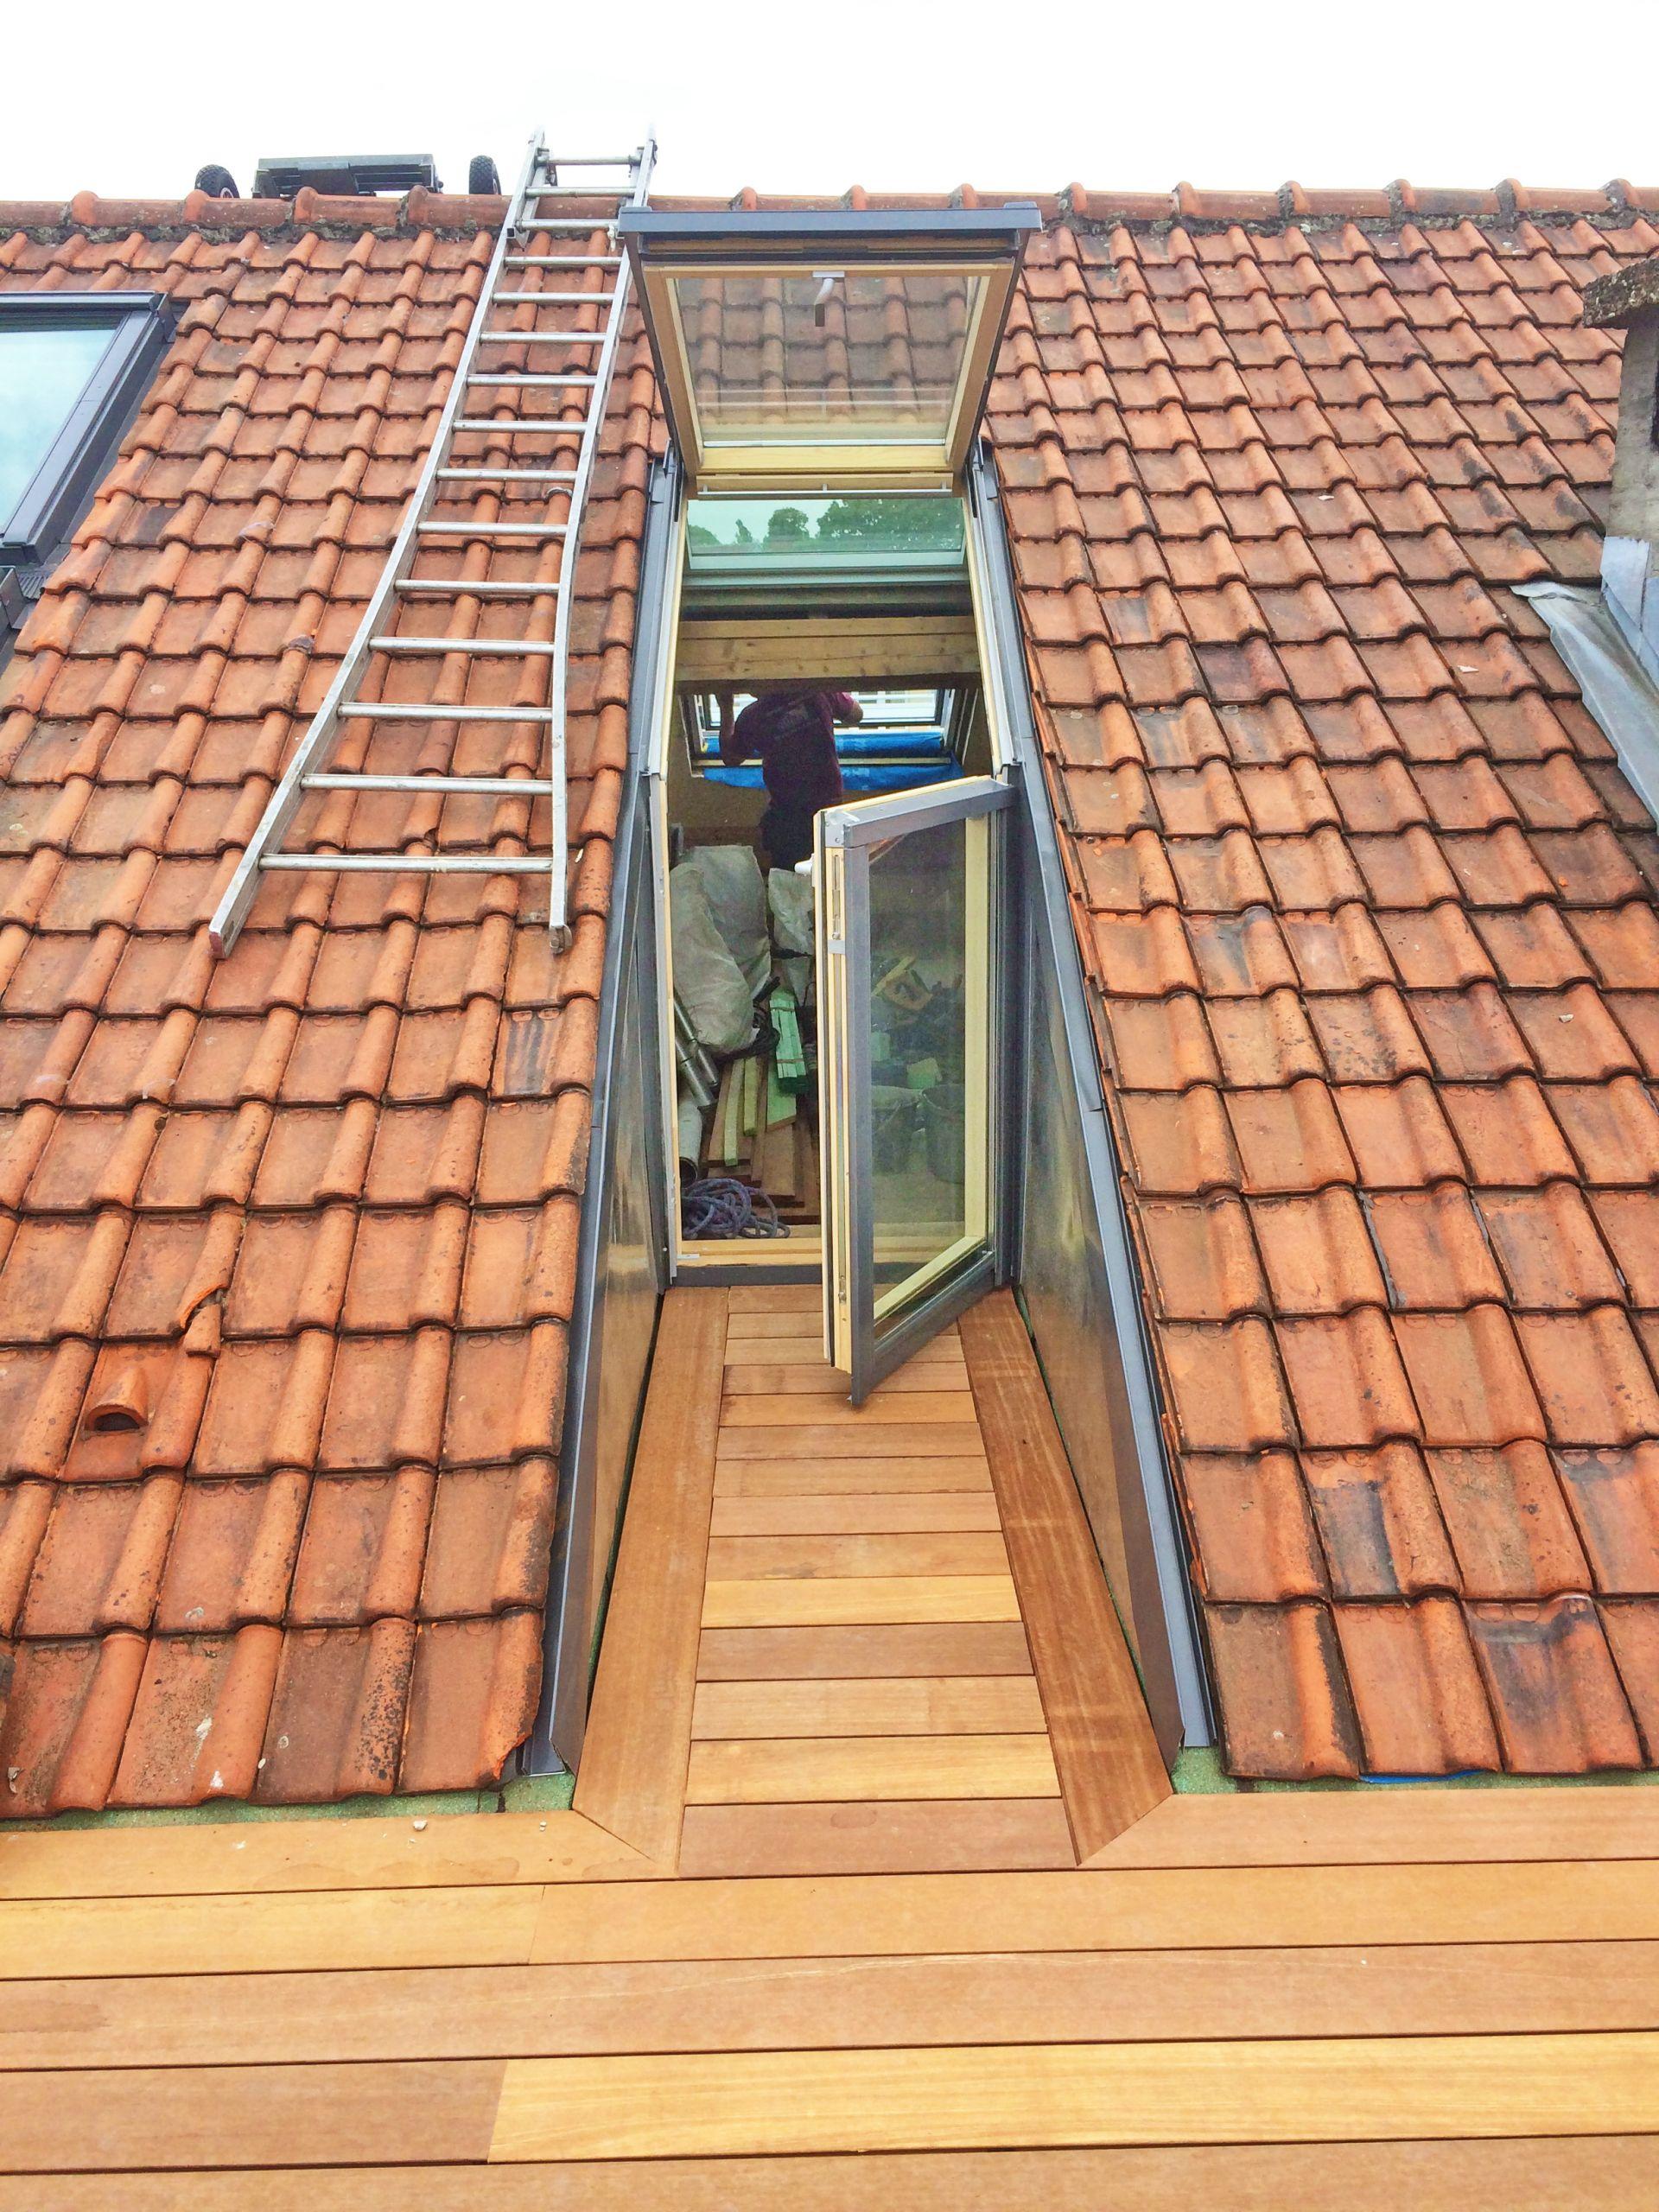 Acces toit Terrasse Terrasse toiture Constant - Idees Conception Jardin | Idees Conception Jardin